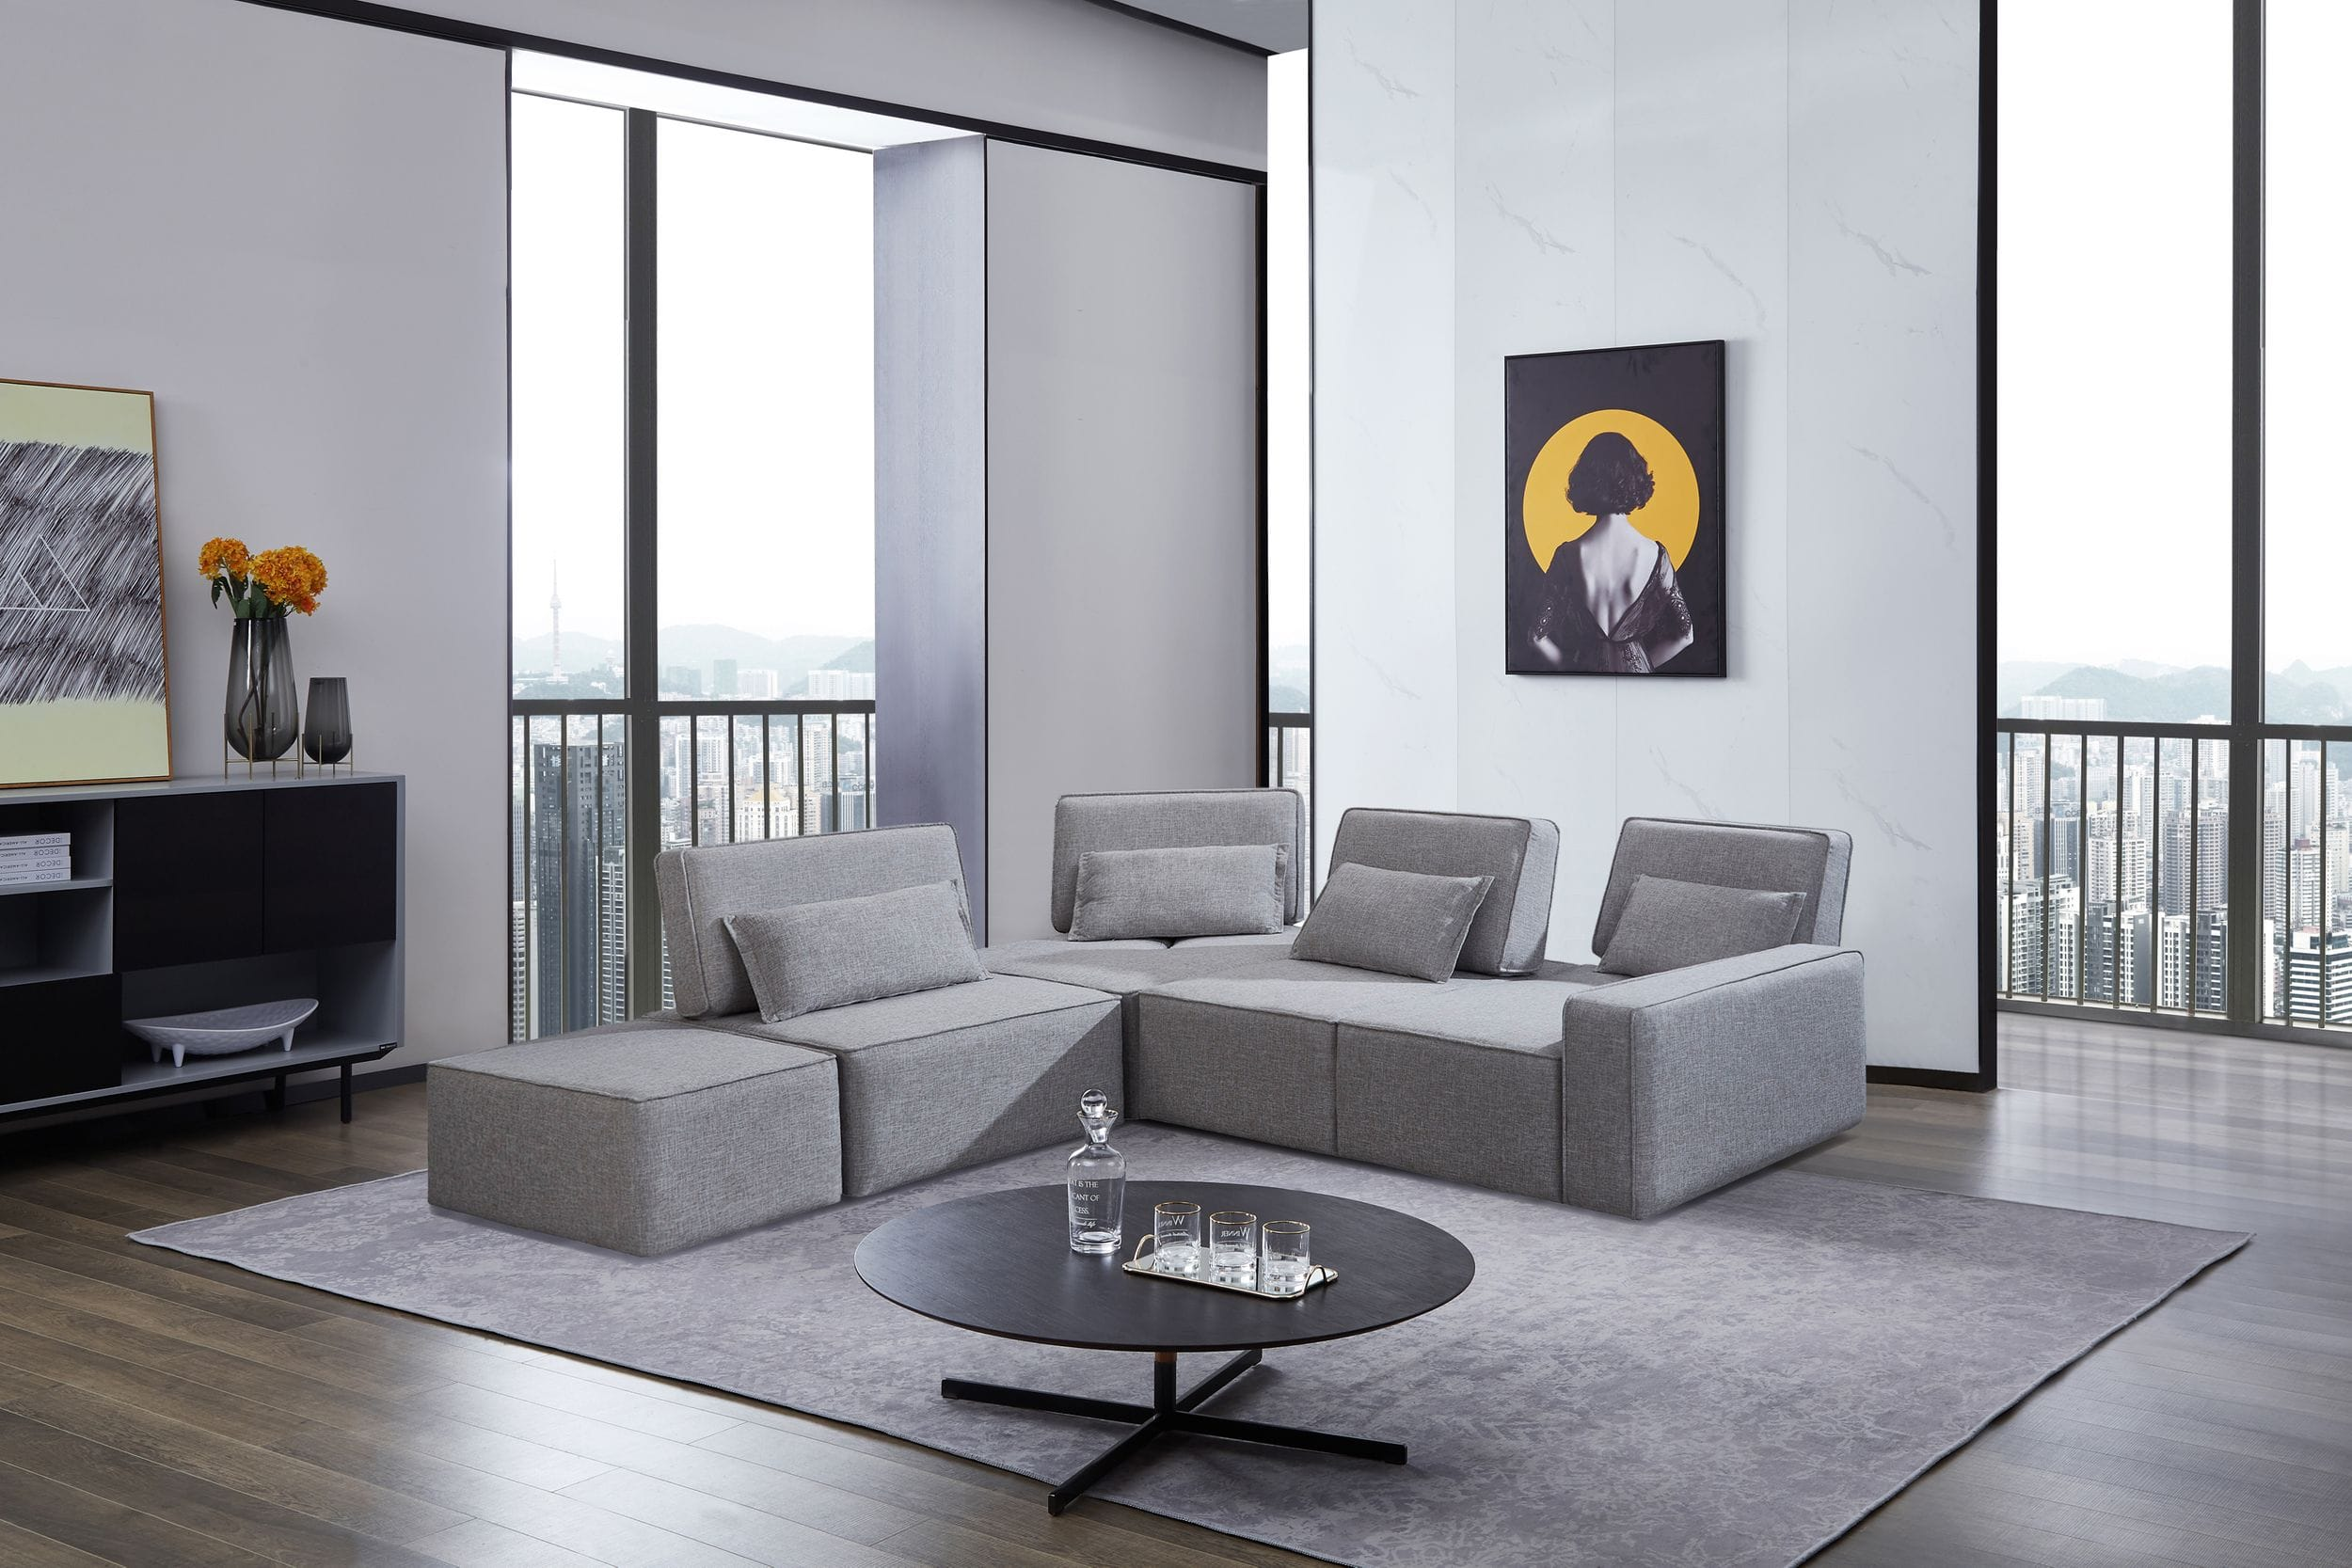 VIG Furniture Divani Casa Chapel Modern Light Grey Fabric Sectional Sofa with Ottoman